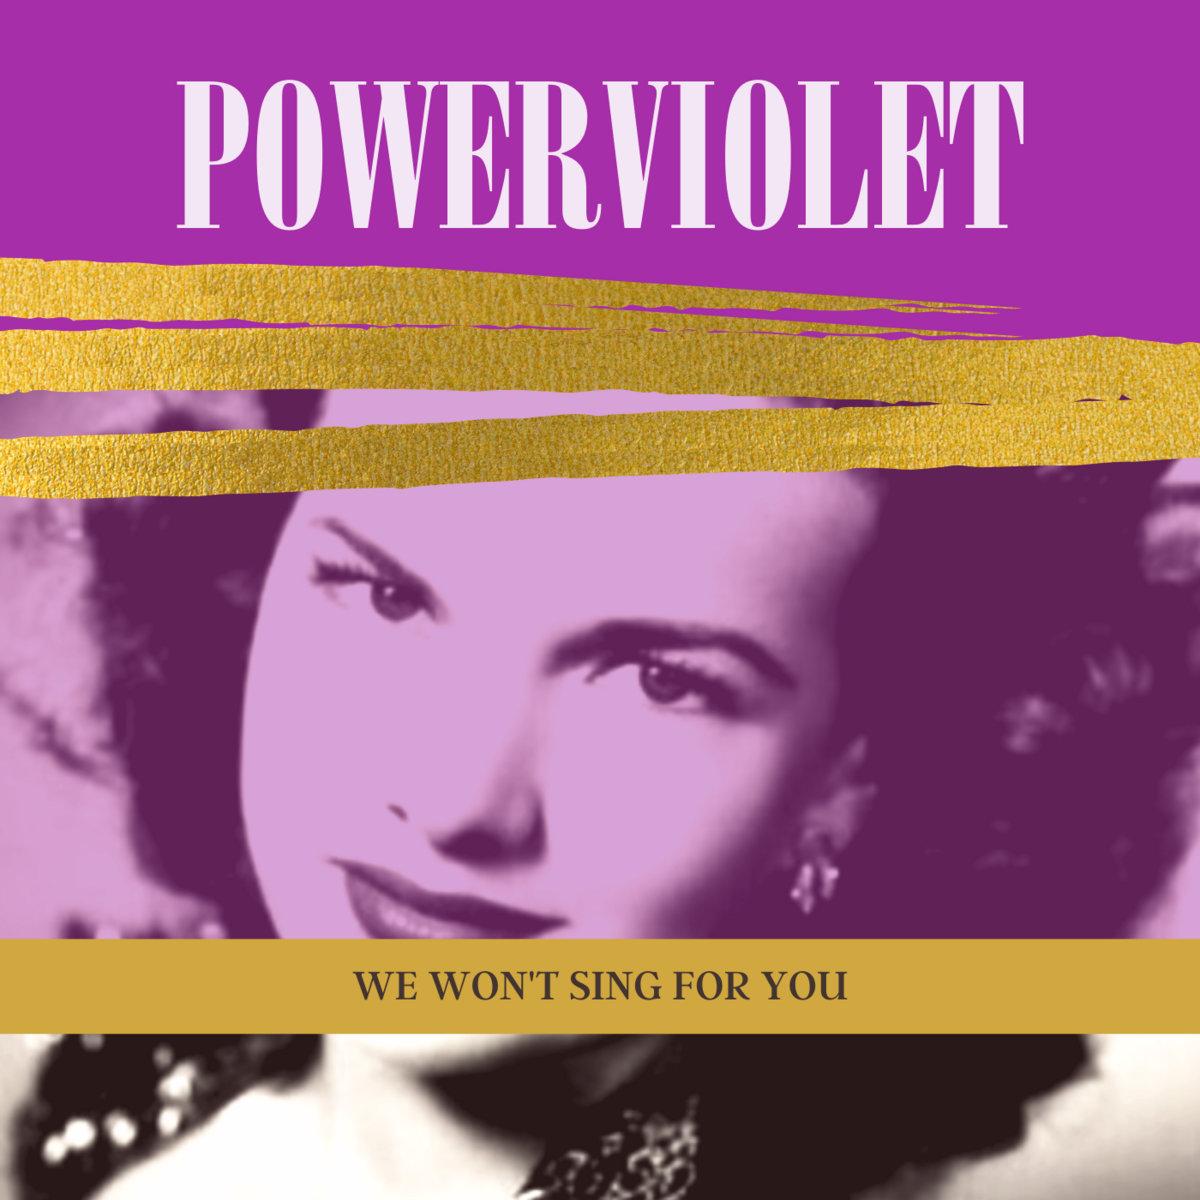 Powerviolet